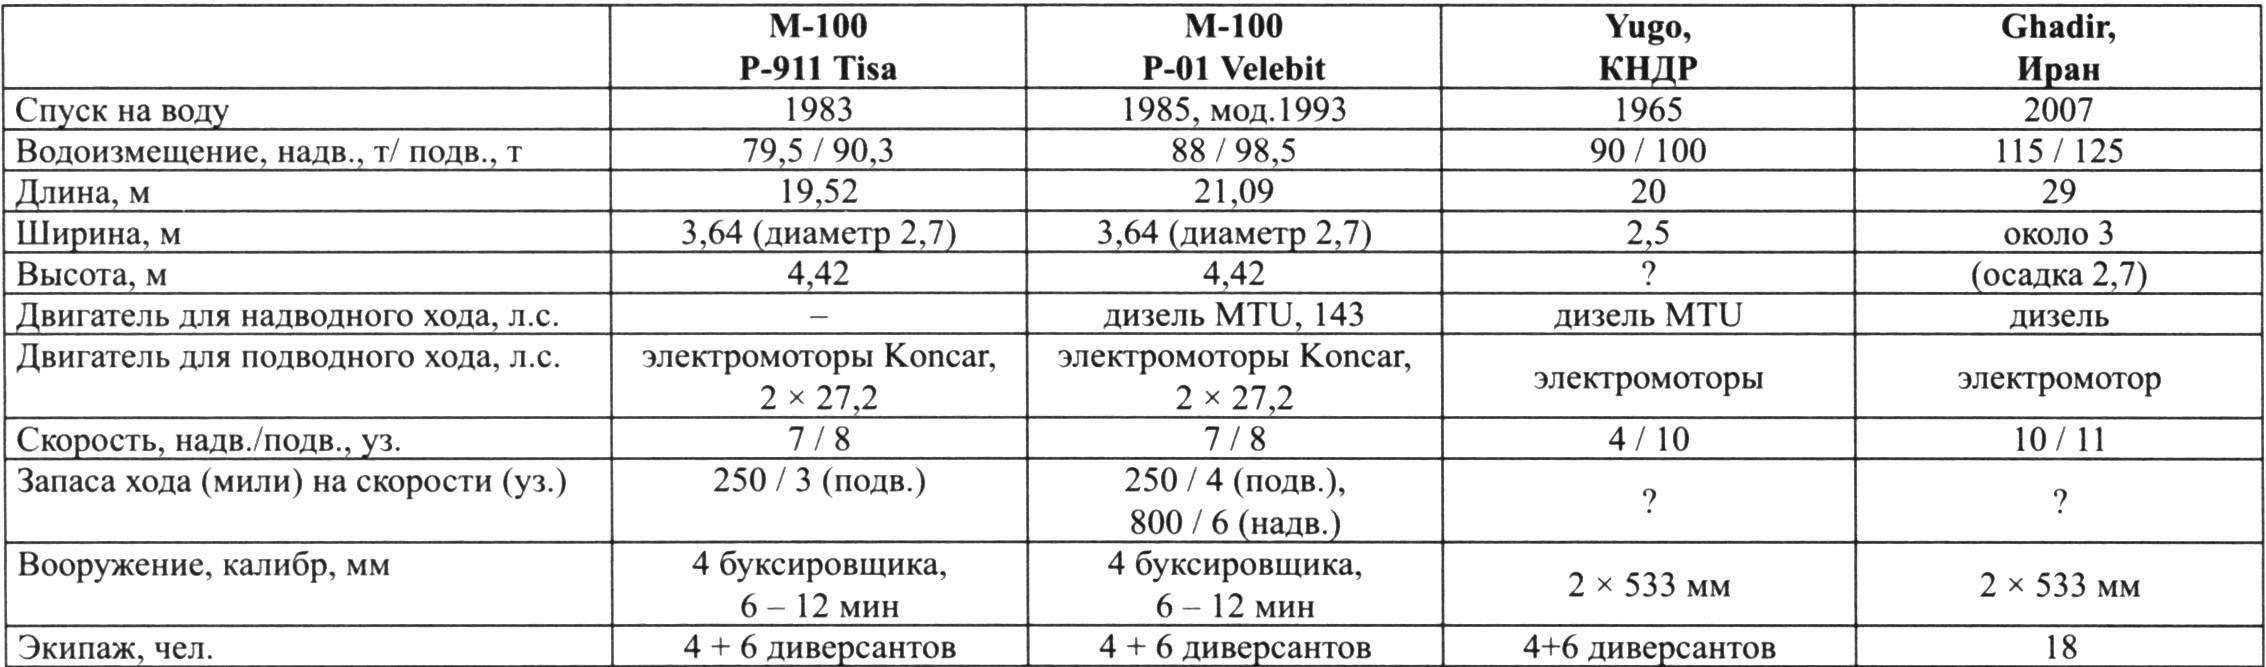 Performance characteristics of midget submarines for the Yugoslav project